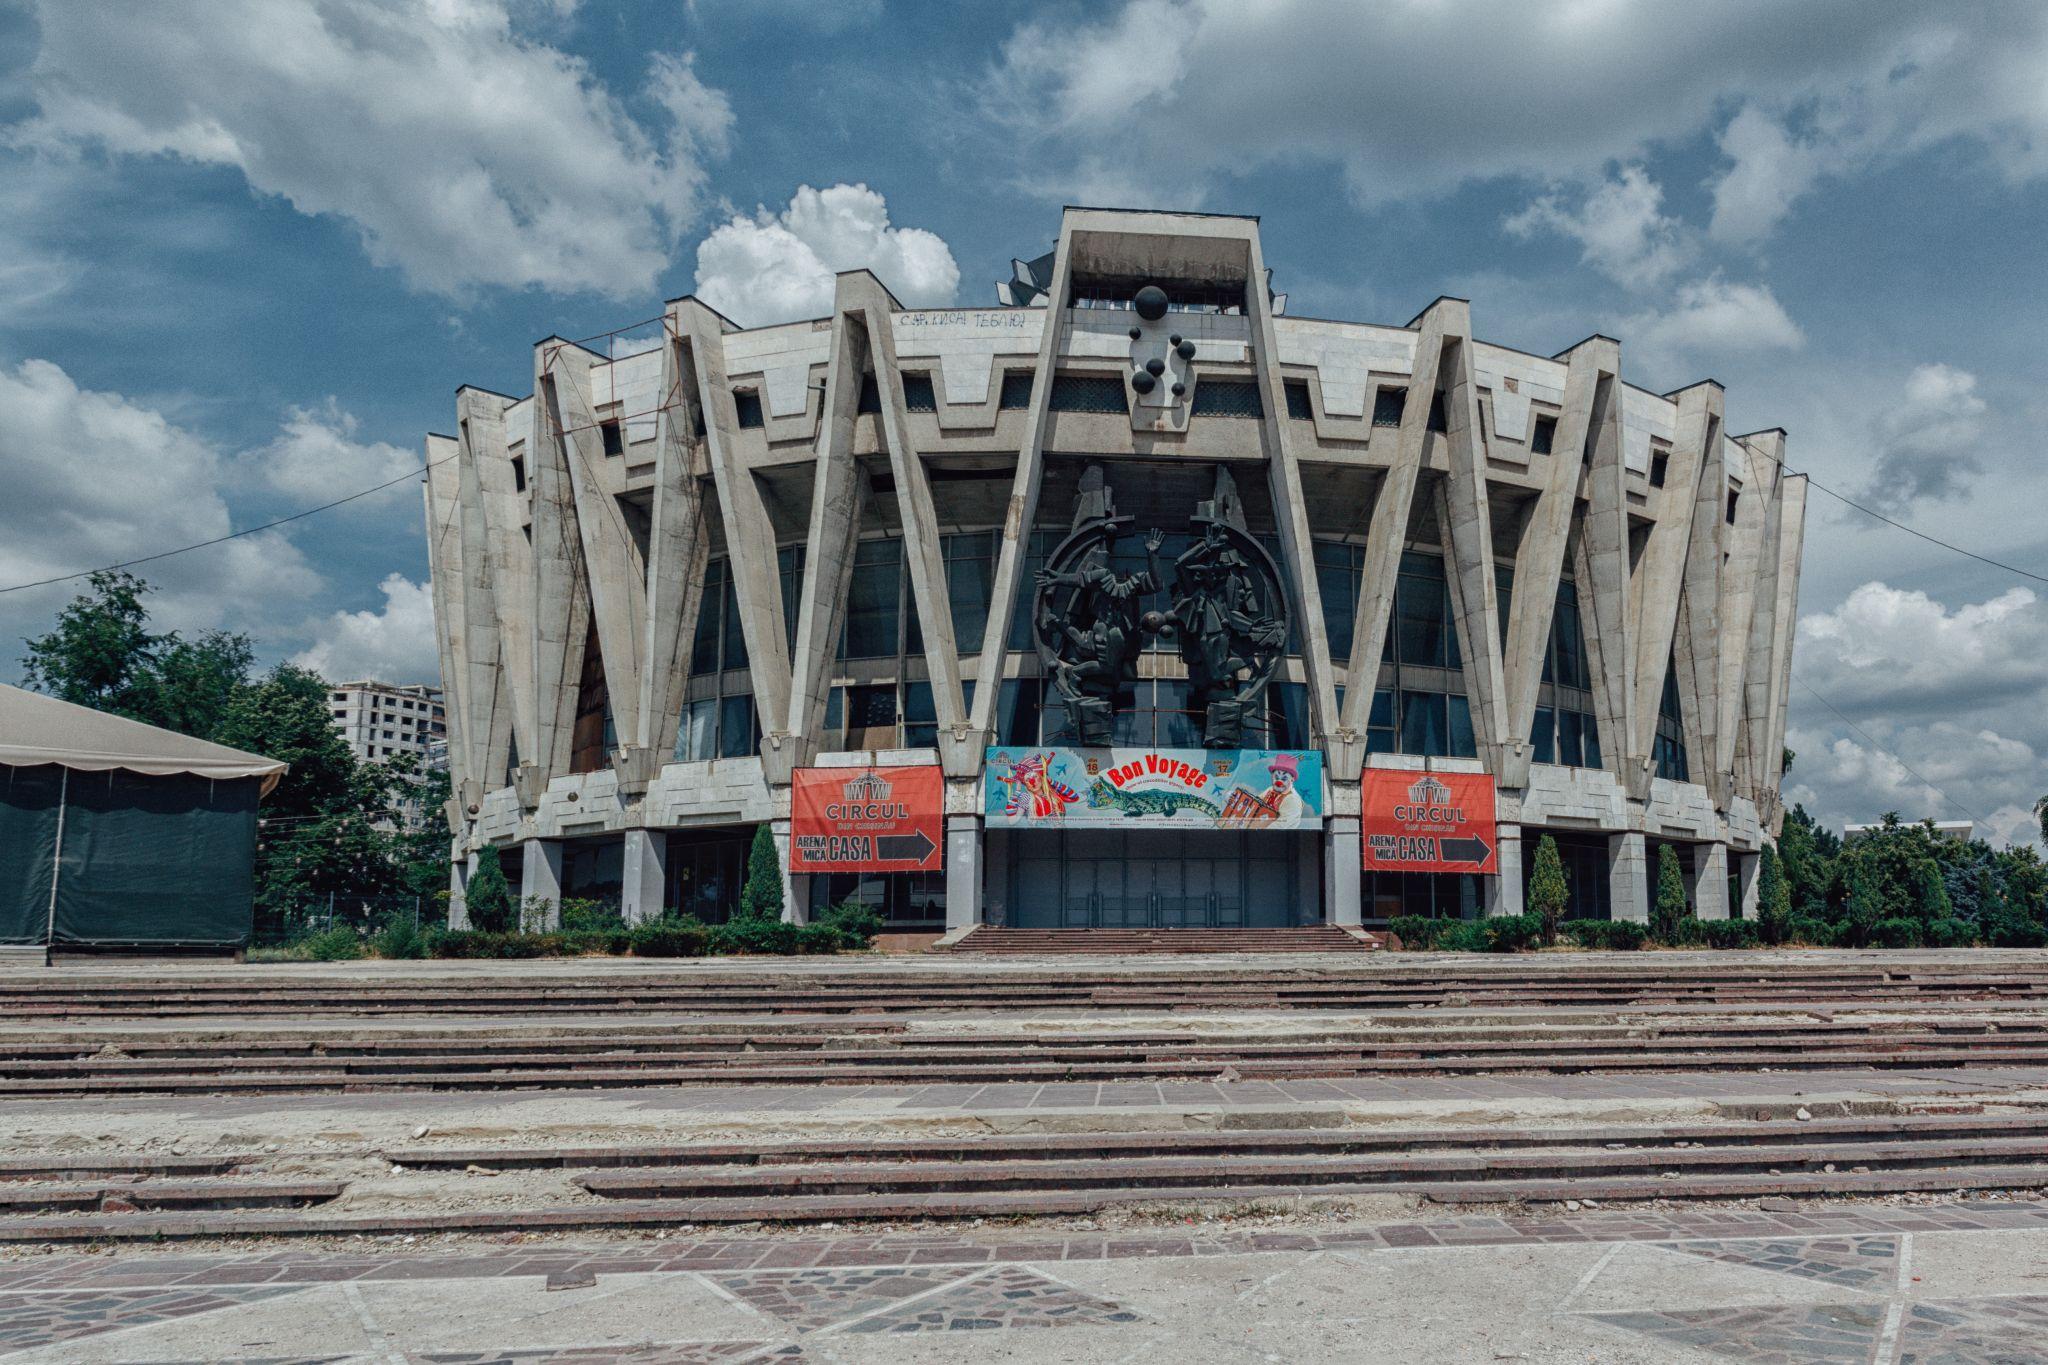 Circus of Moldova, Moldova